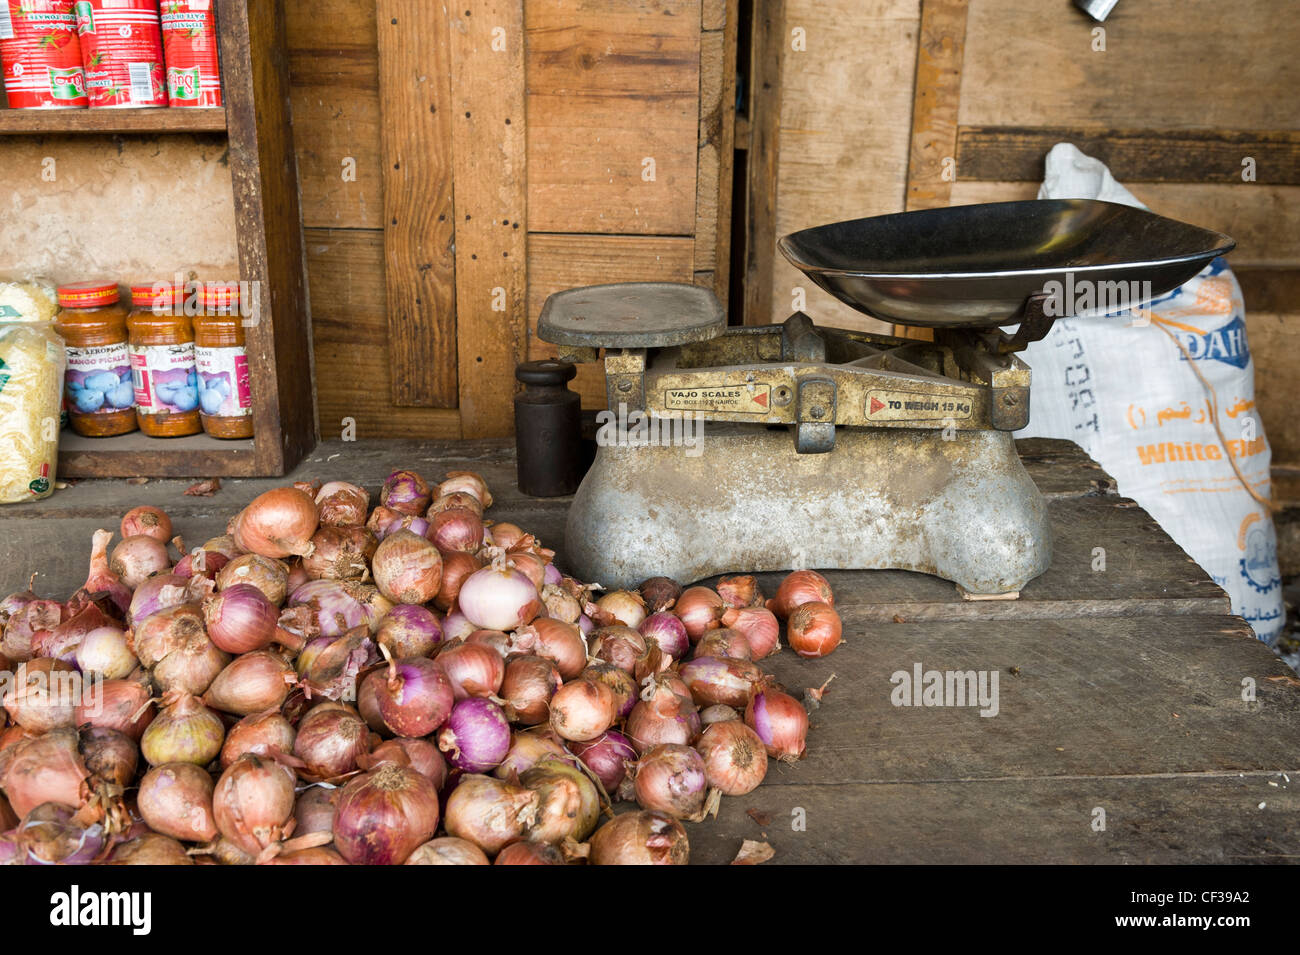 Onions and scale in Darajani market Stone Town Zanzibar Tanzania - Stock Image